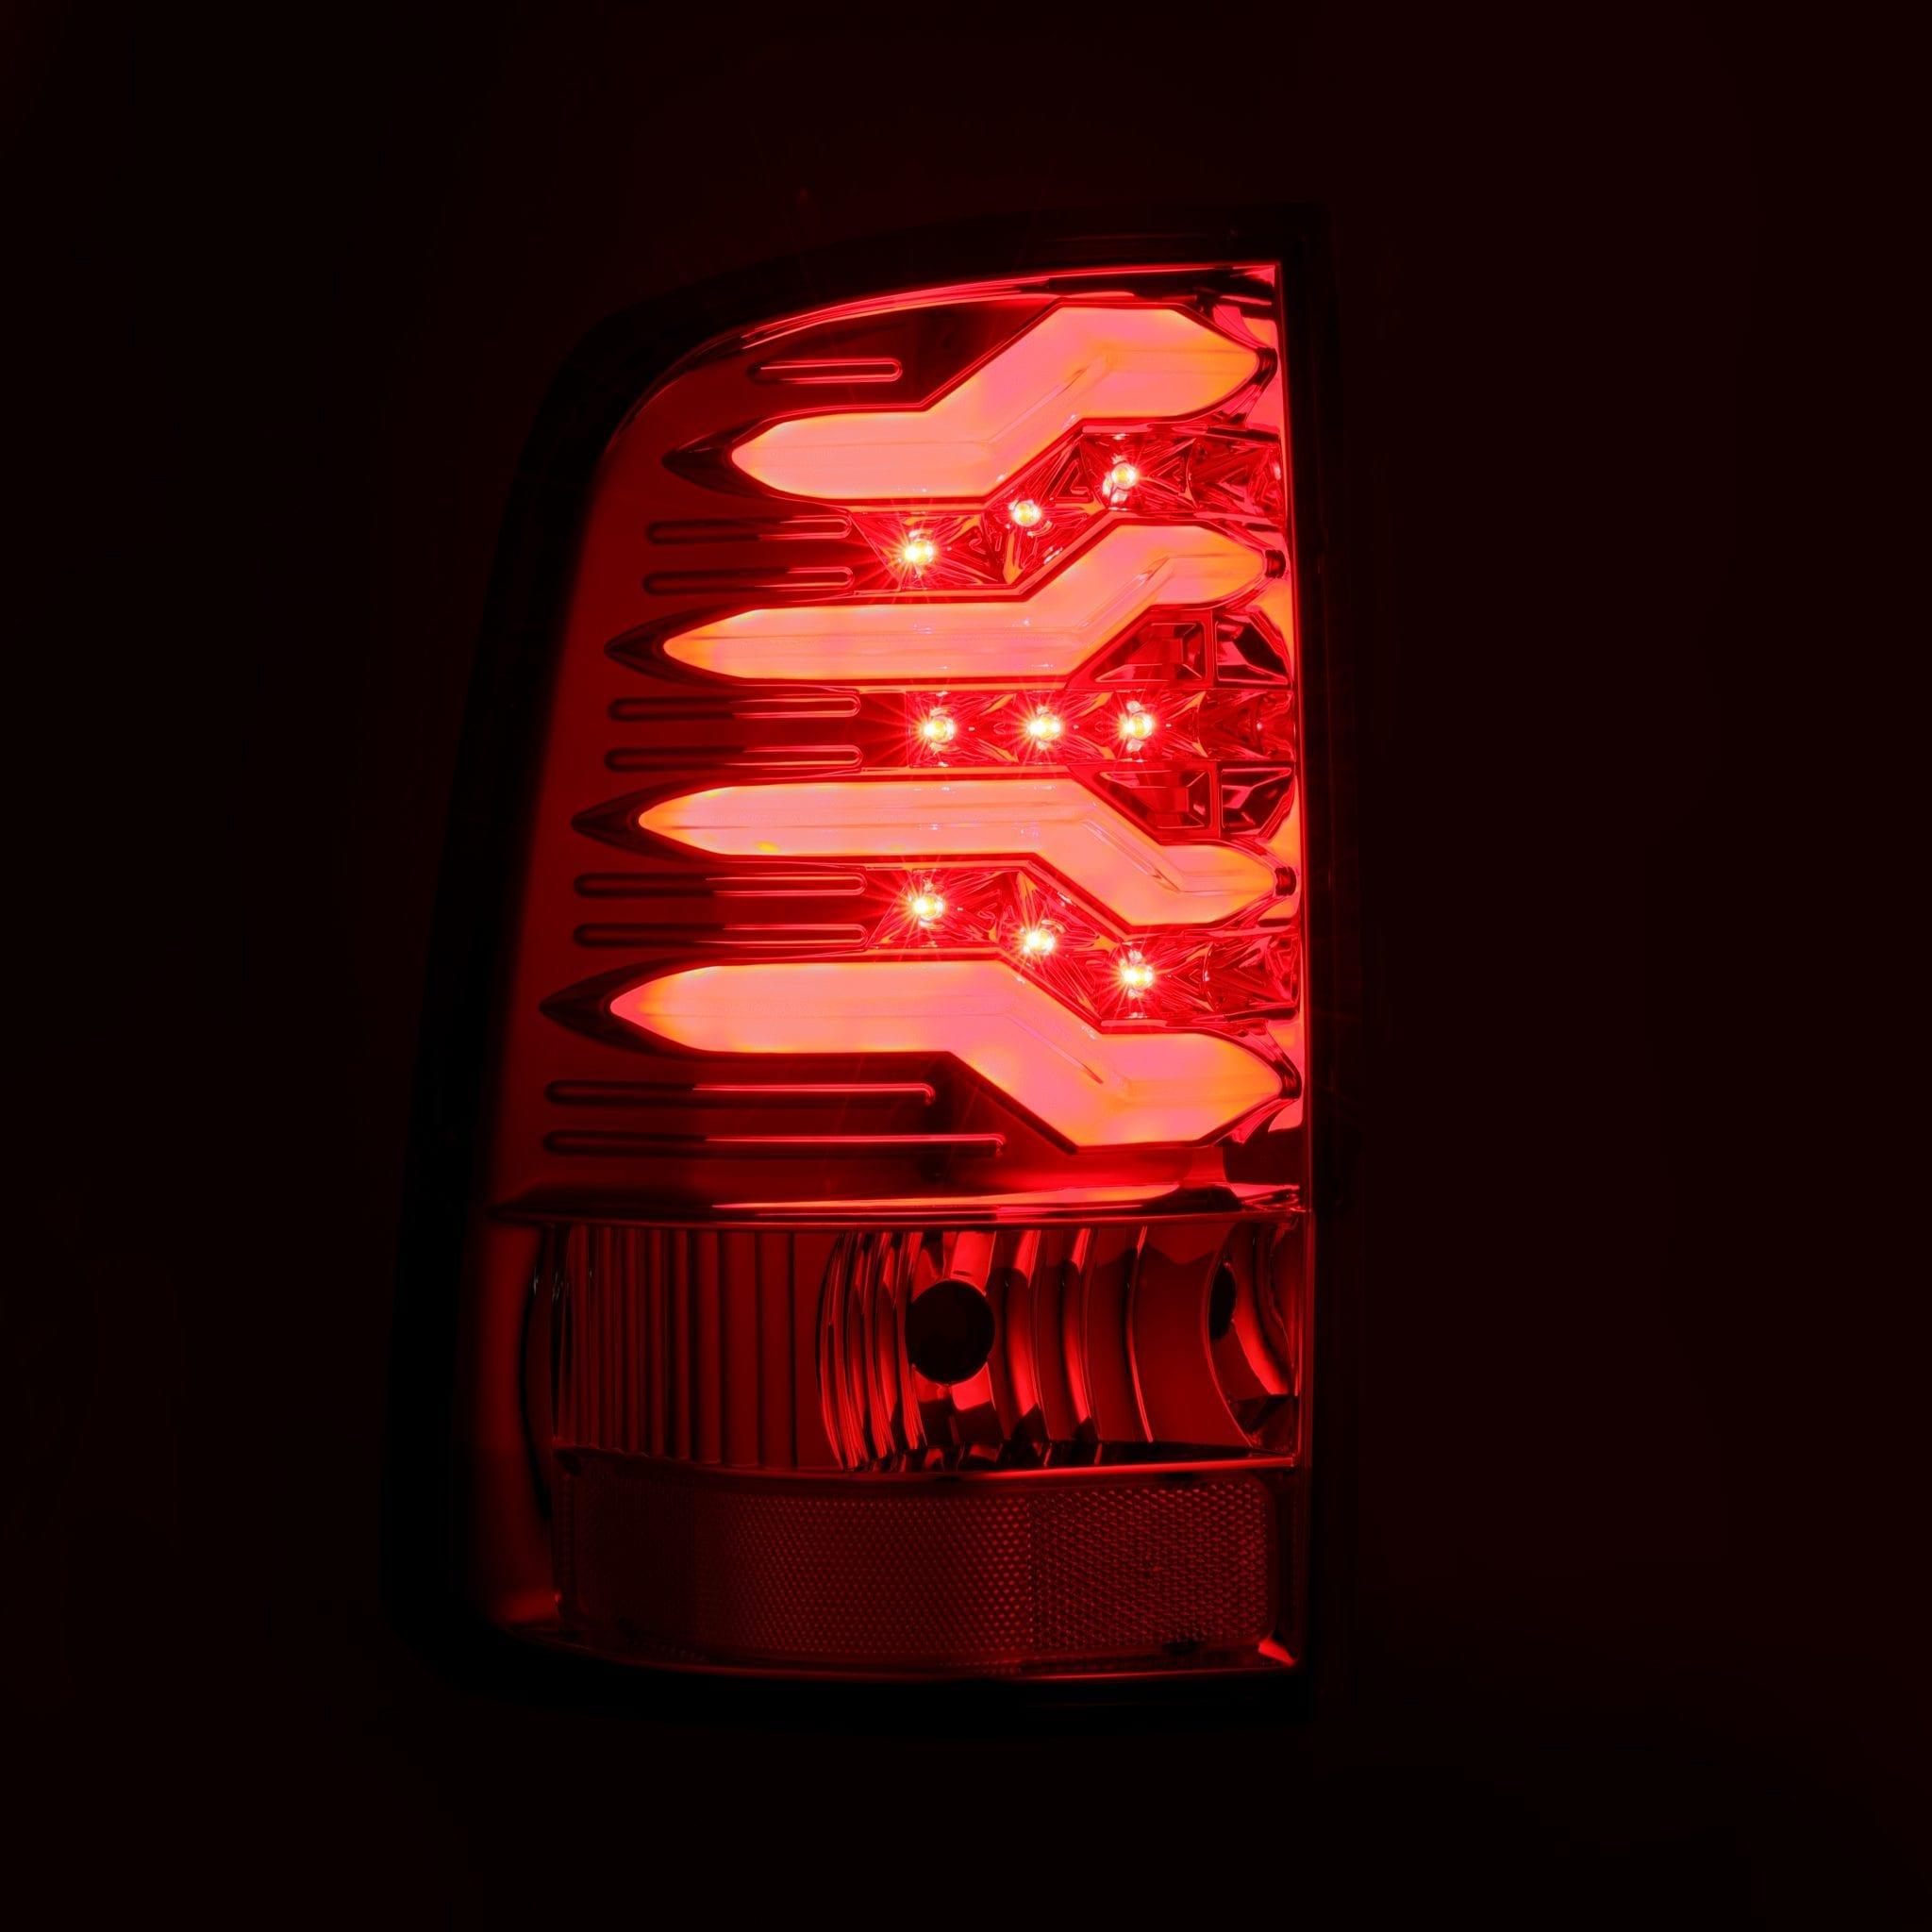 2009 2010 2011 2012 2013 2014 2015 2016 2017 2018 Ram 1500/2500/3500 PRO-Series LED Tail Lights Red Smoke